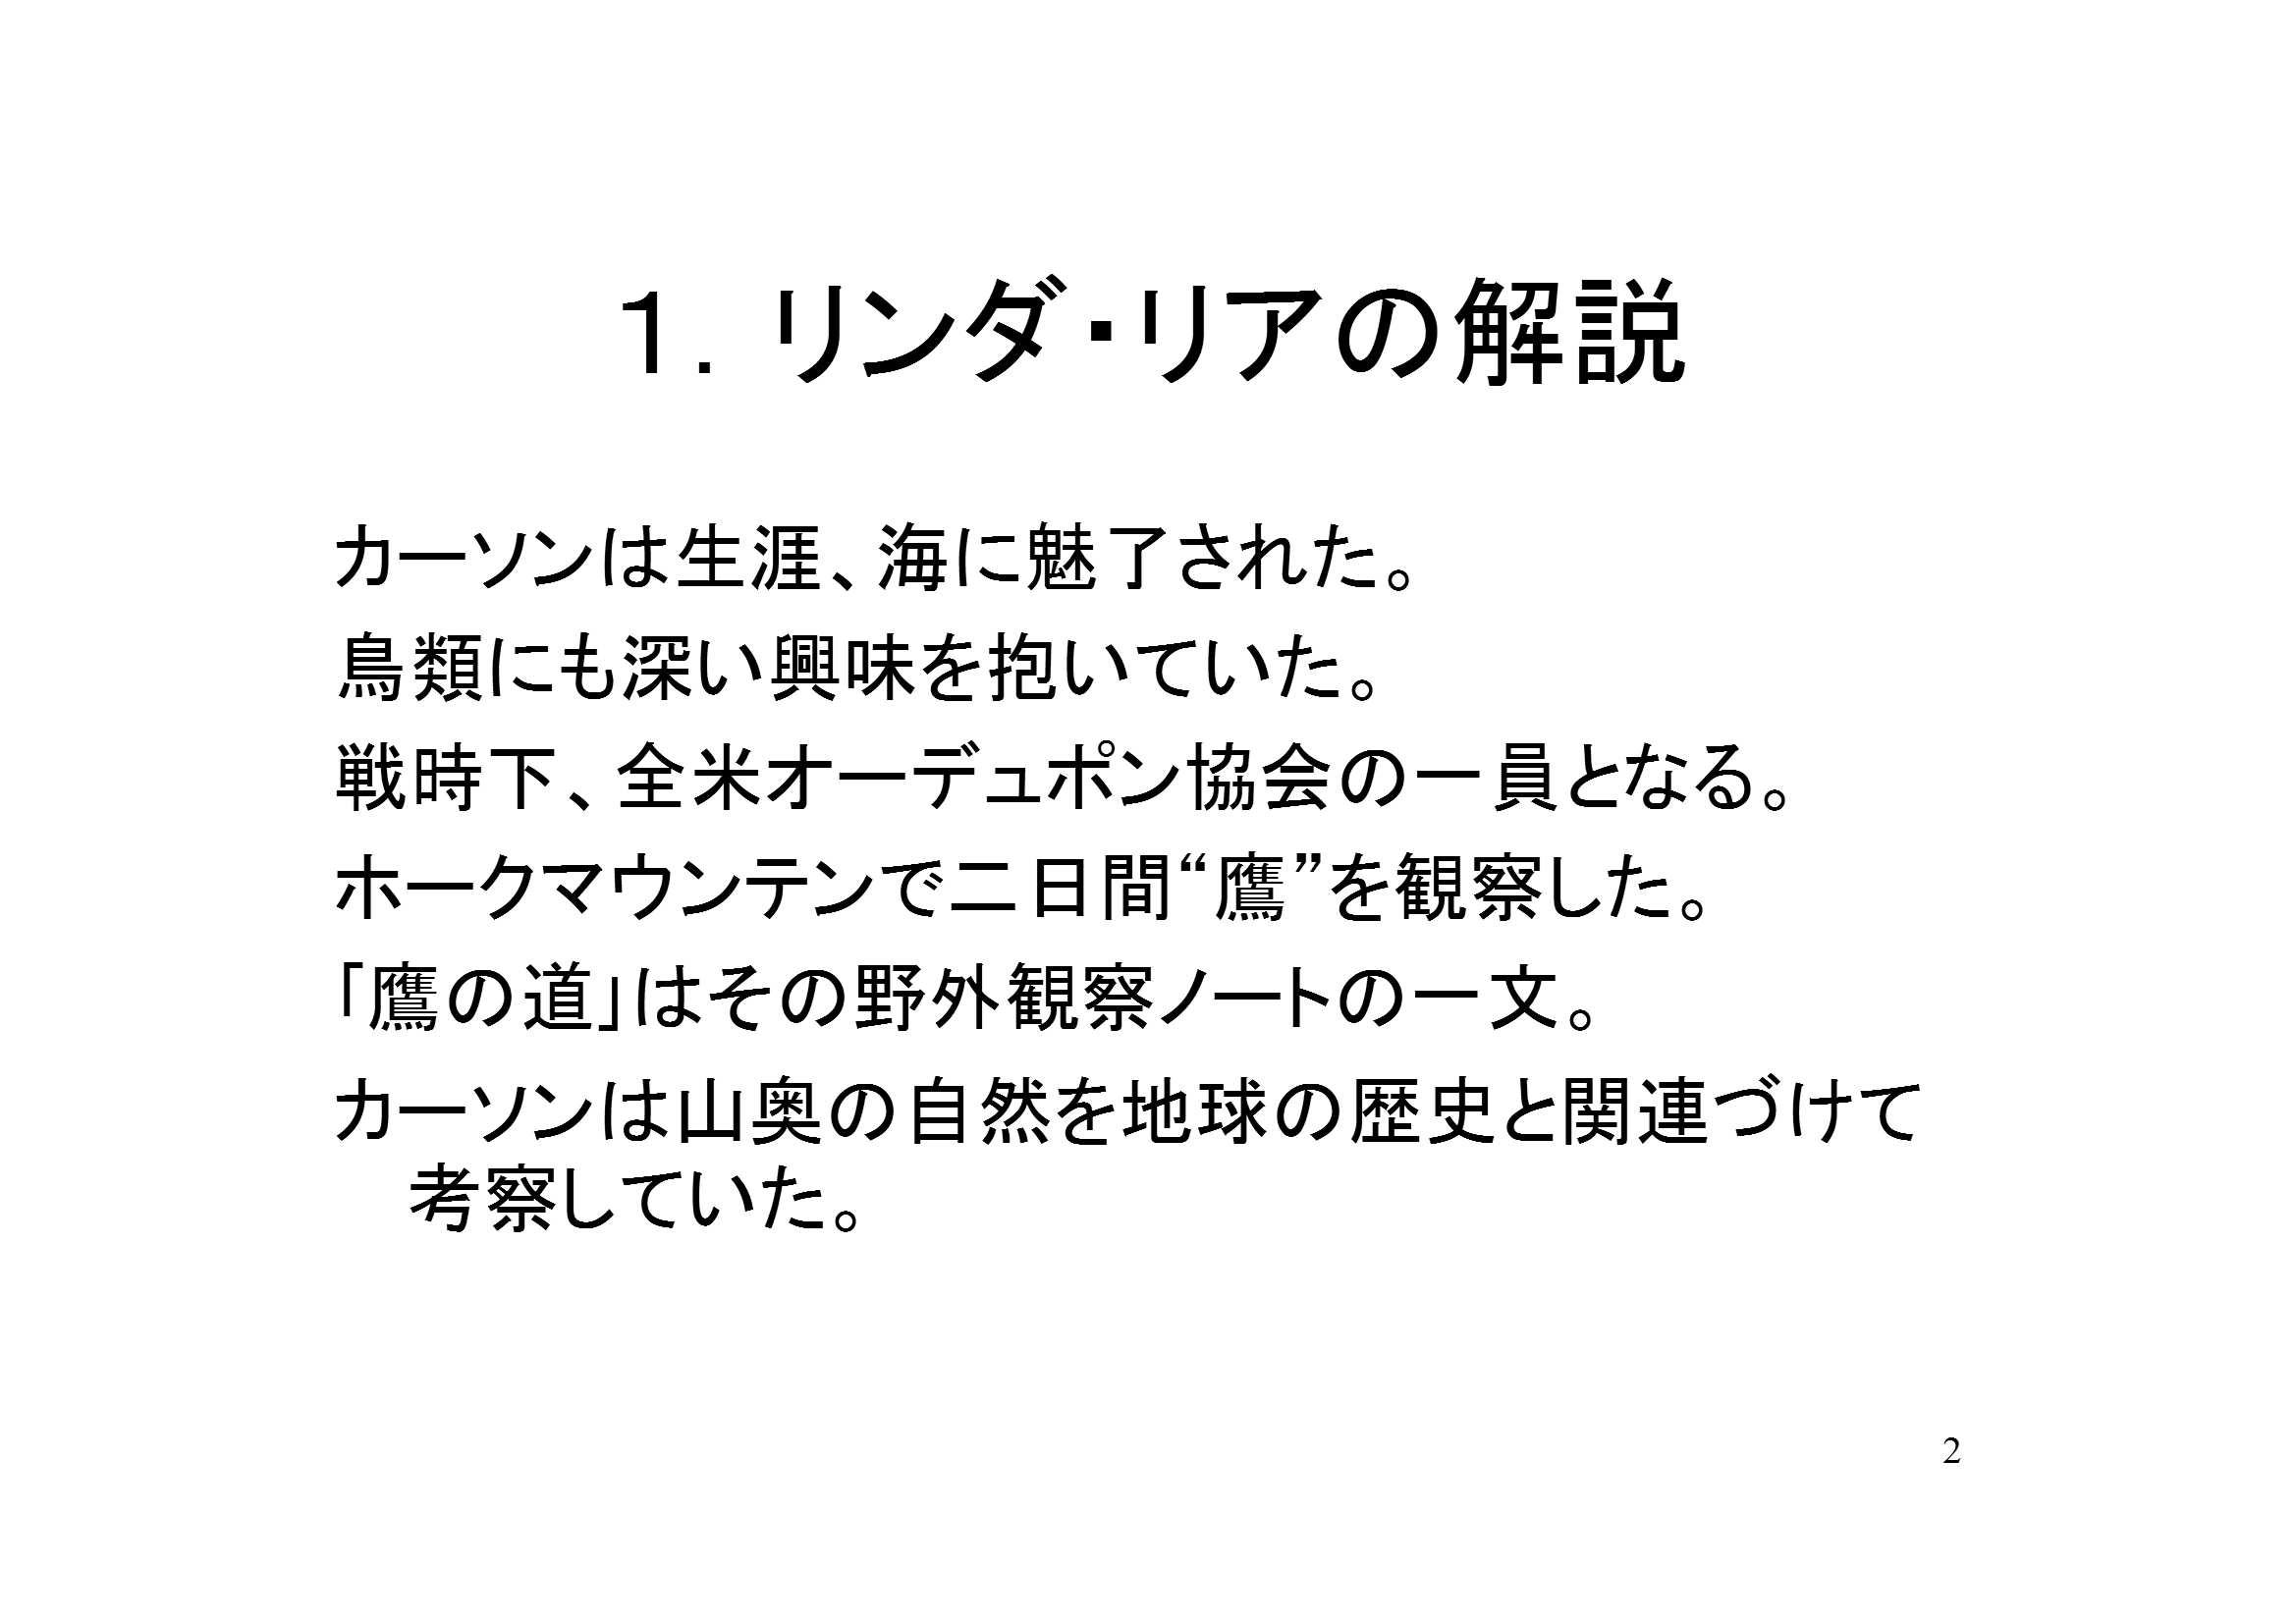 201212202208039a3.jpg